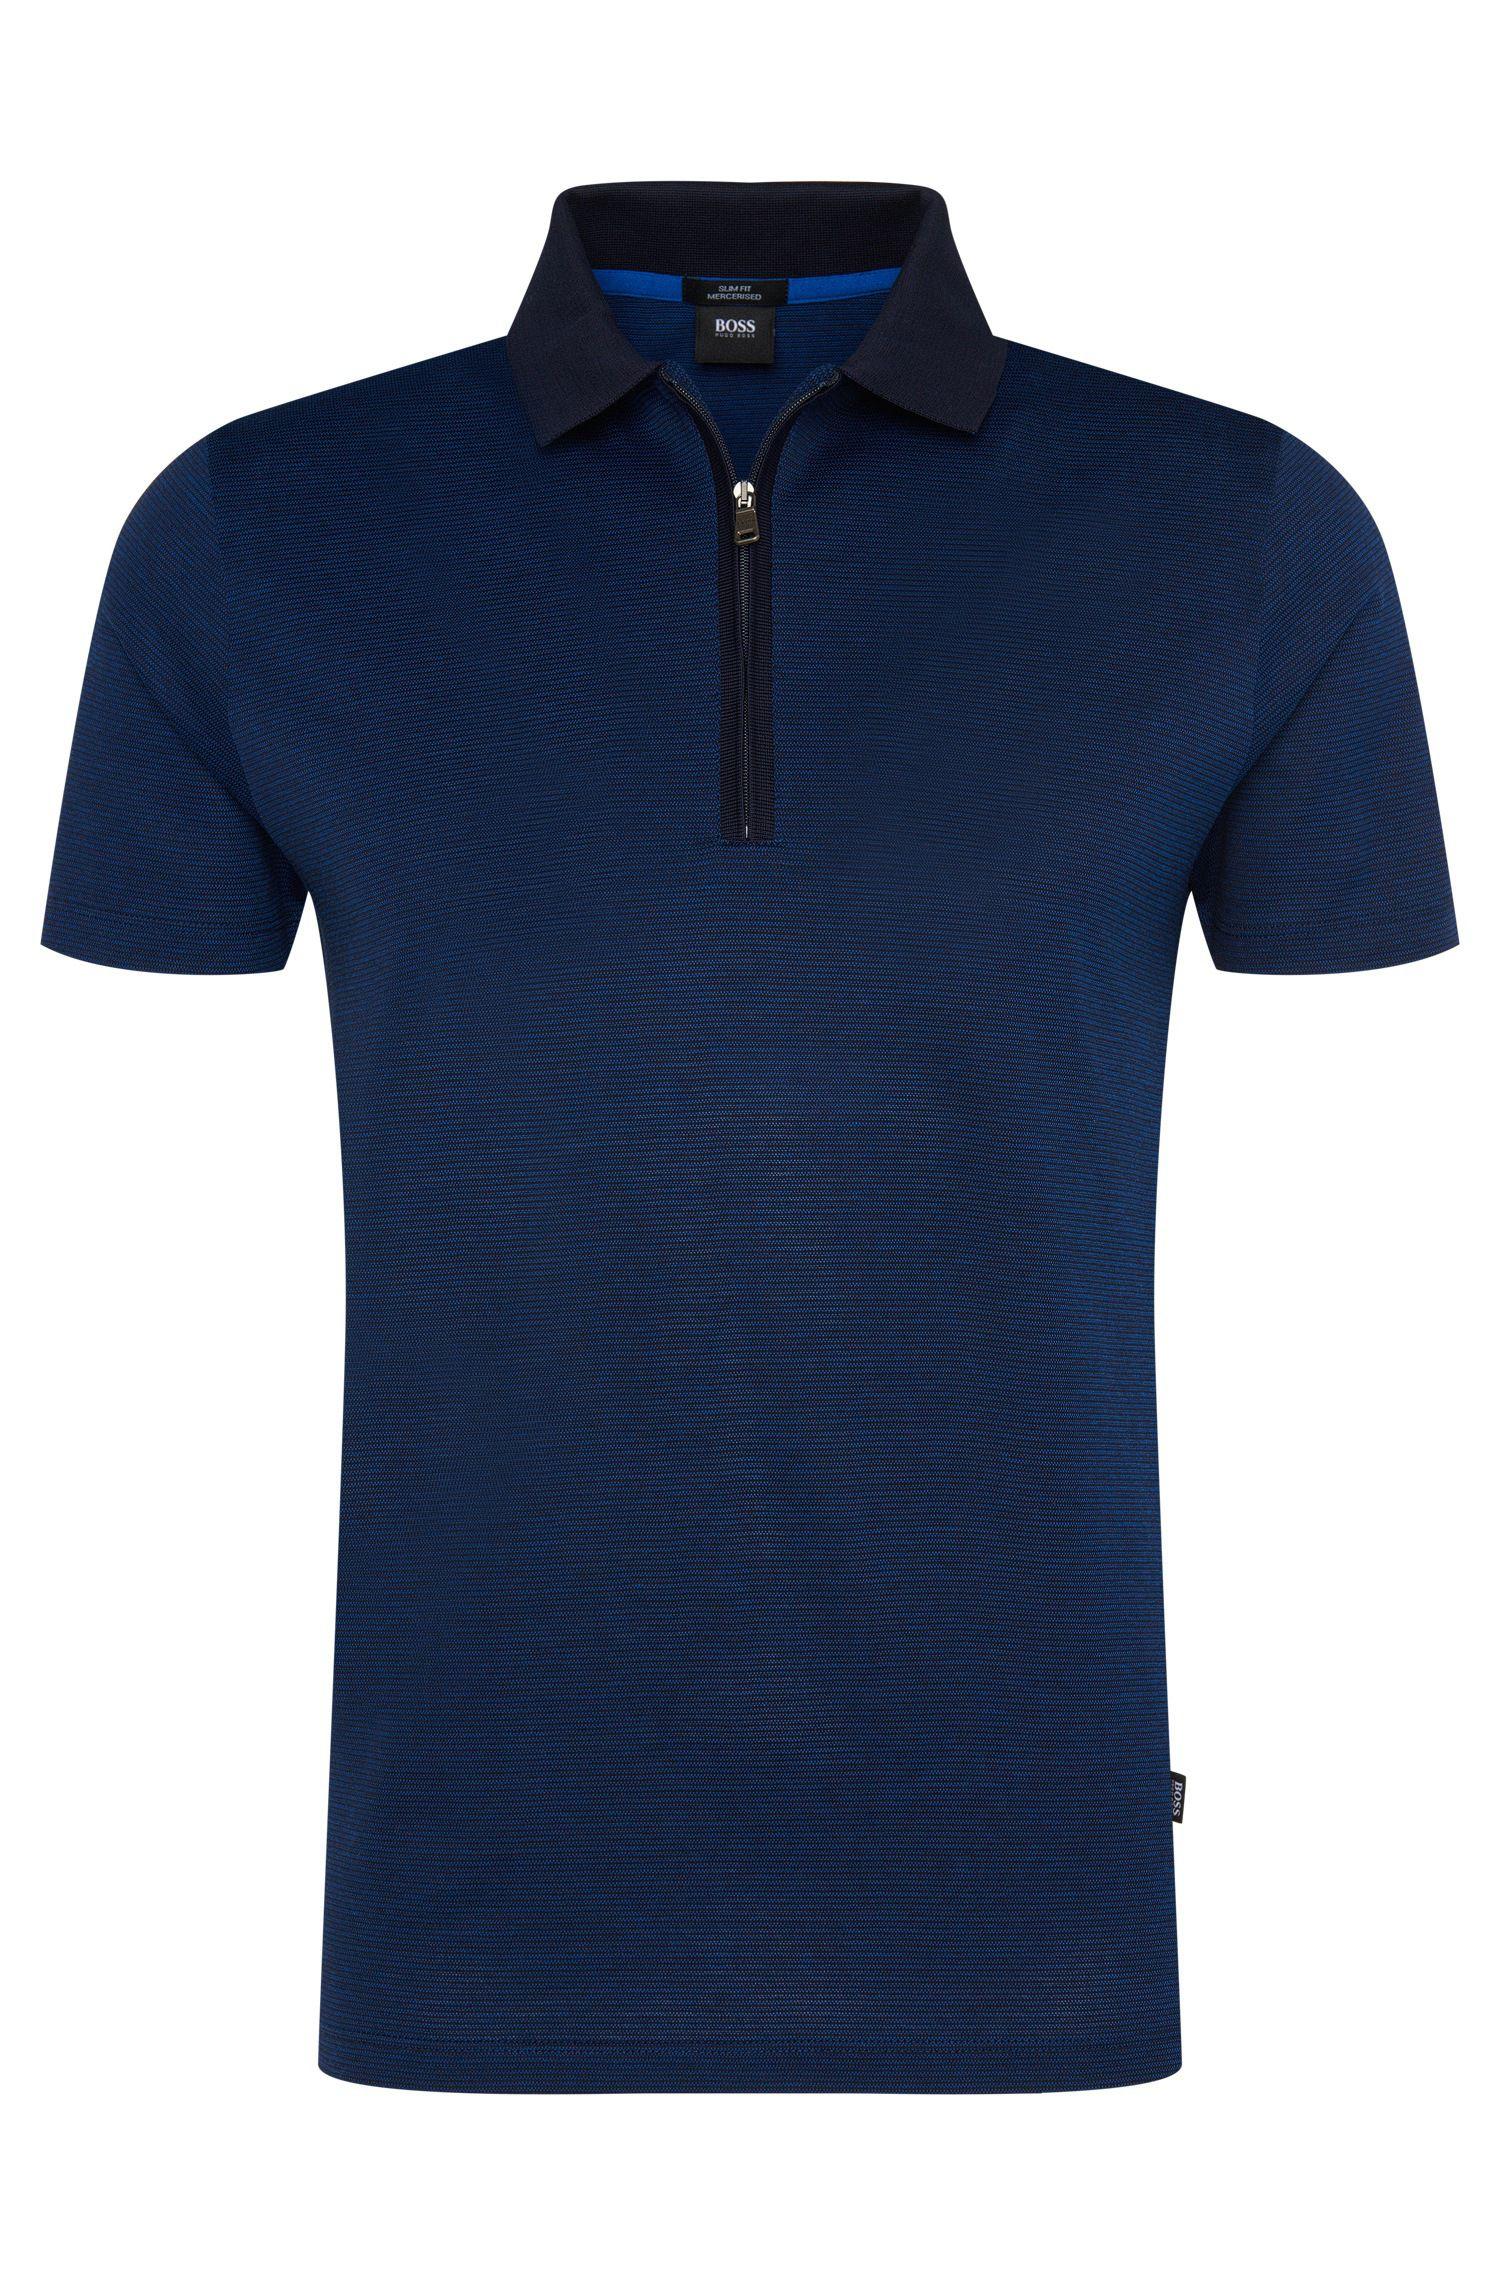 'Polston'   Slim Fit, Mercerized Cotton Zip Polo Shirt